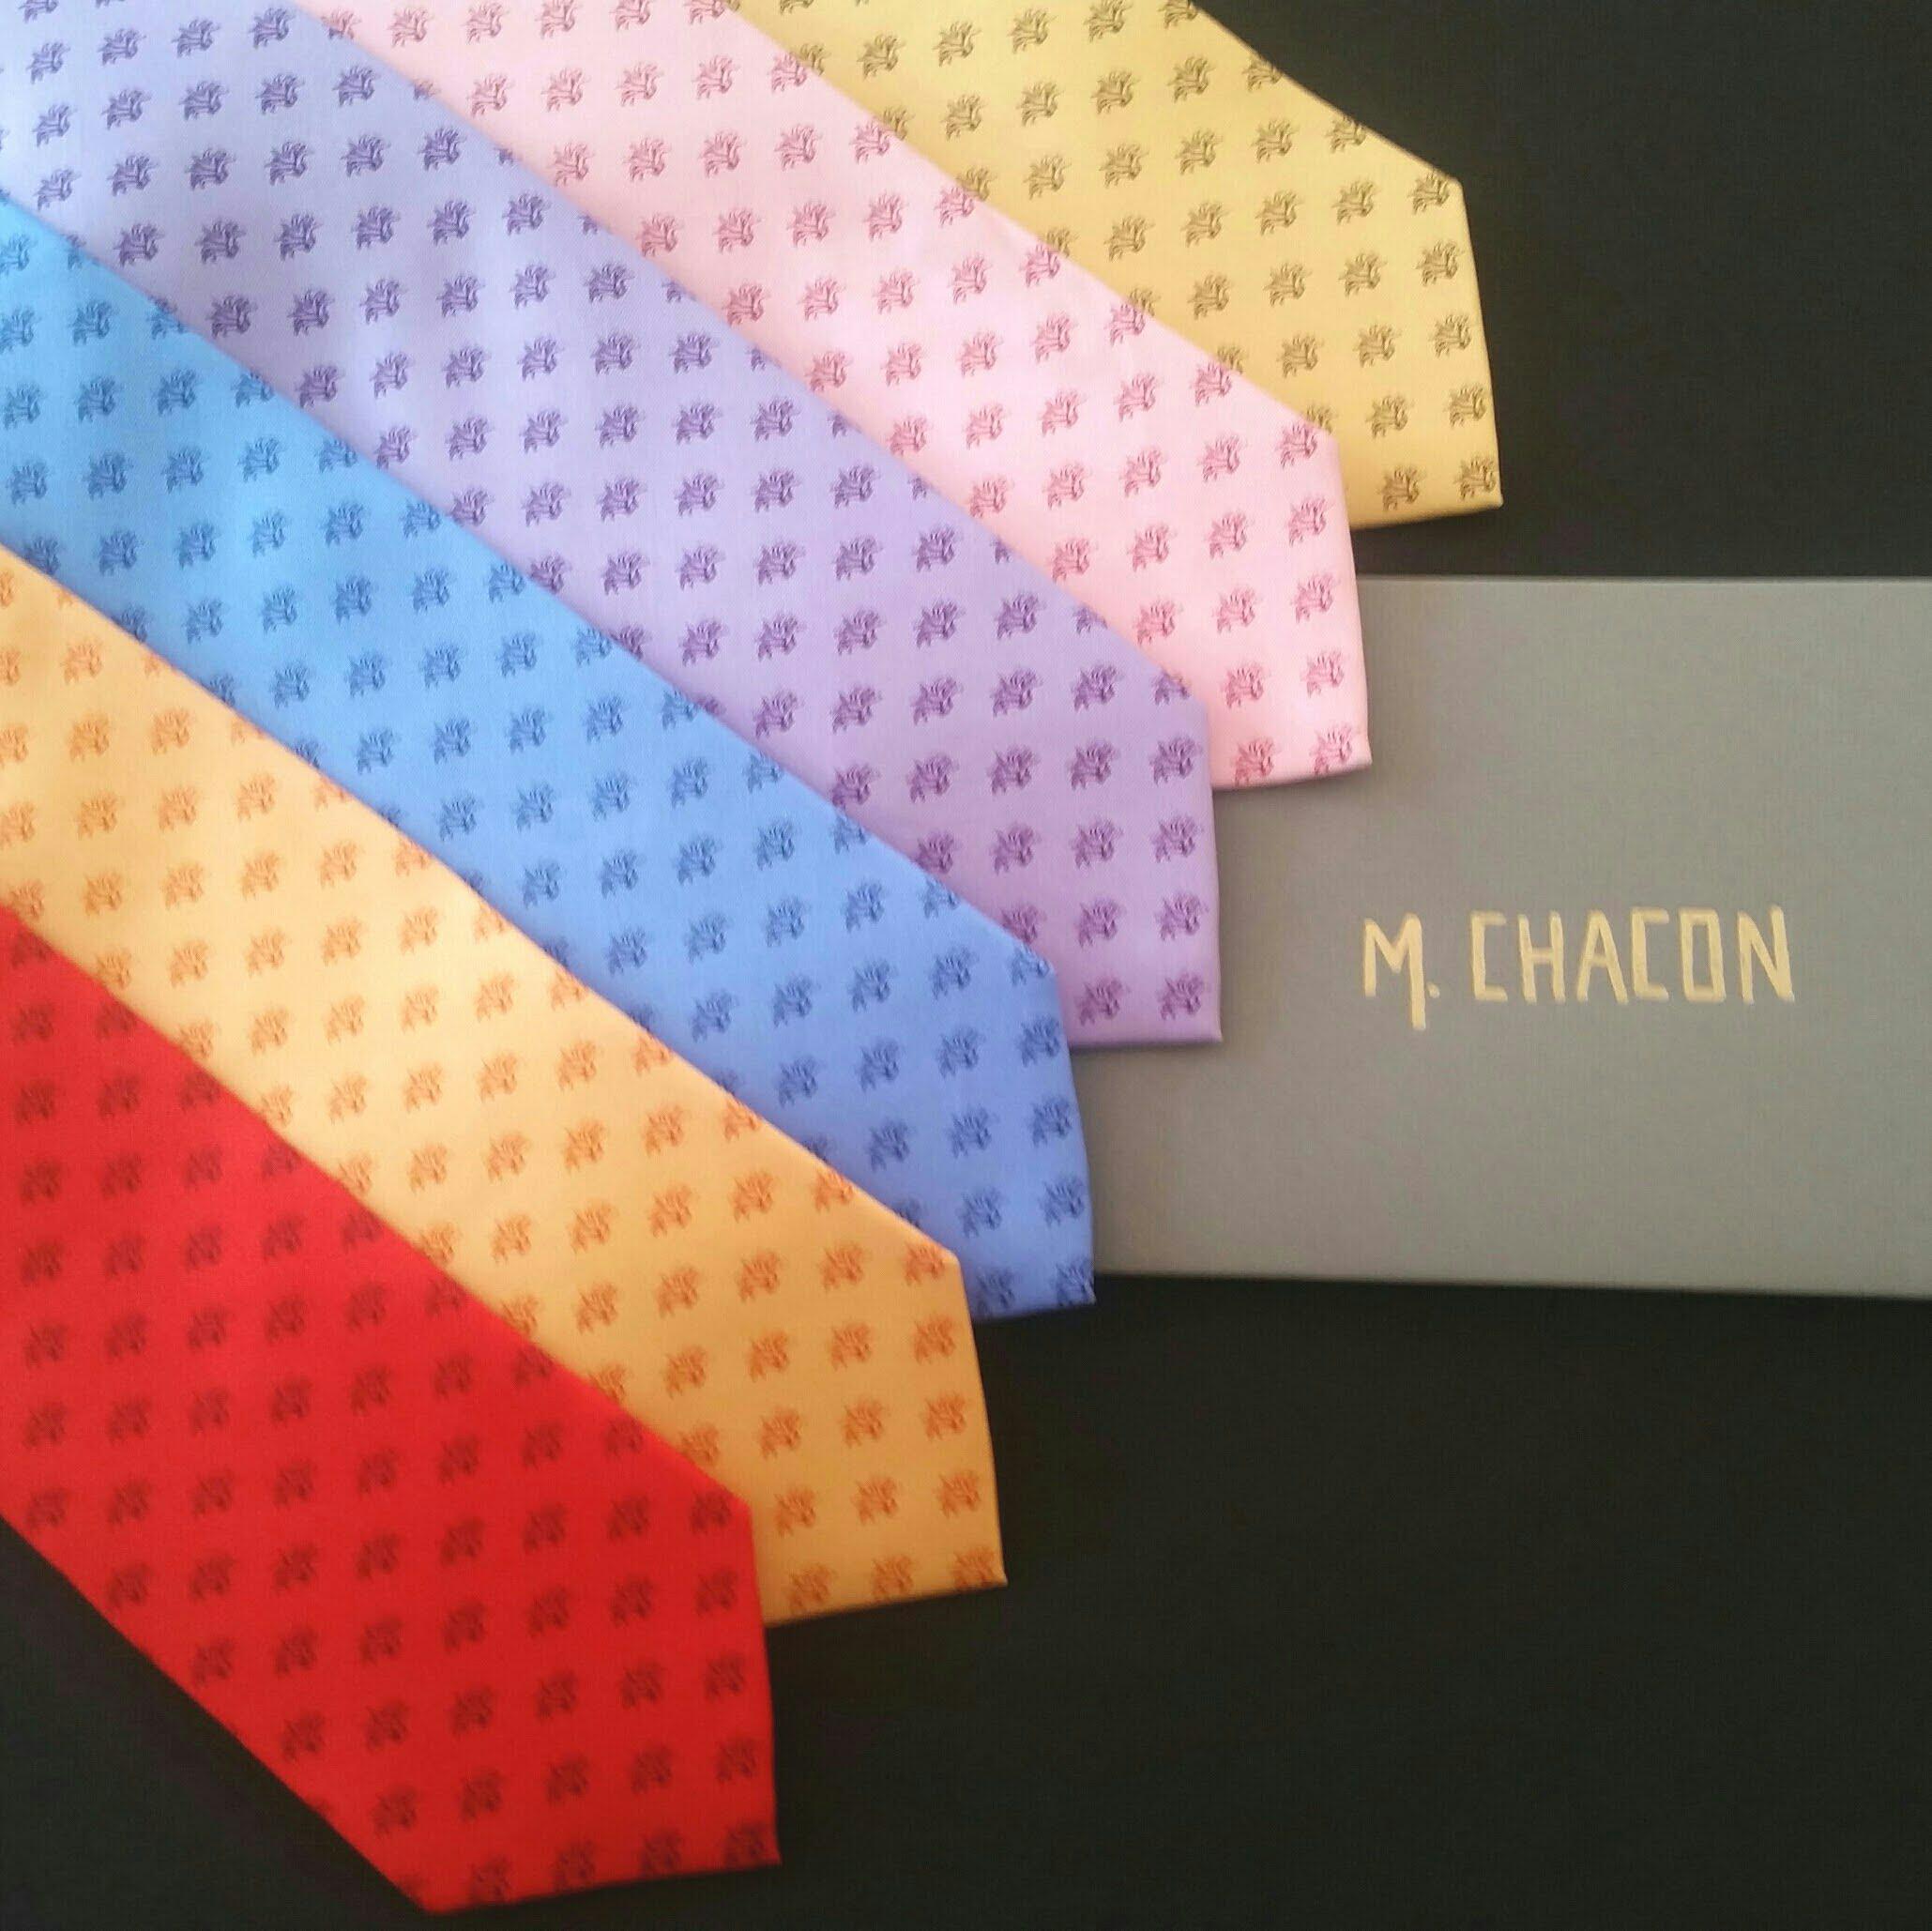 Corbata Agaves  100 % seda  Rojo, naranja, amarillo, lila, azul y rosa.